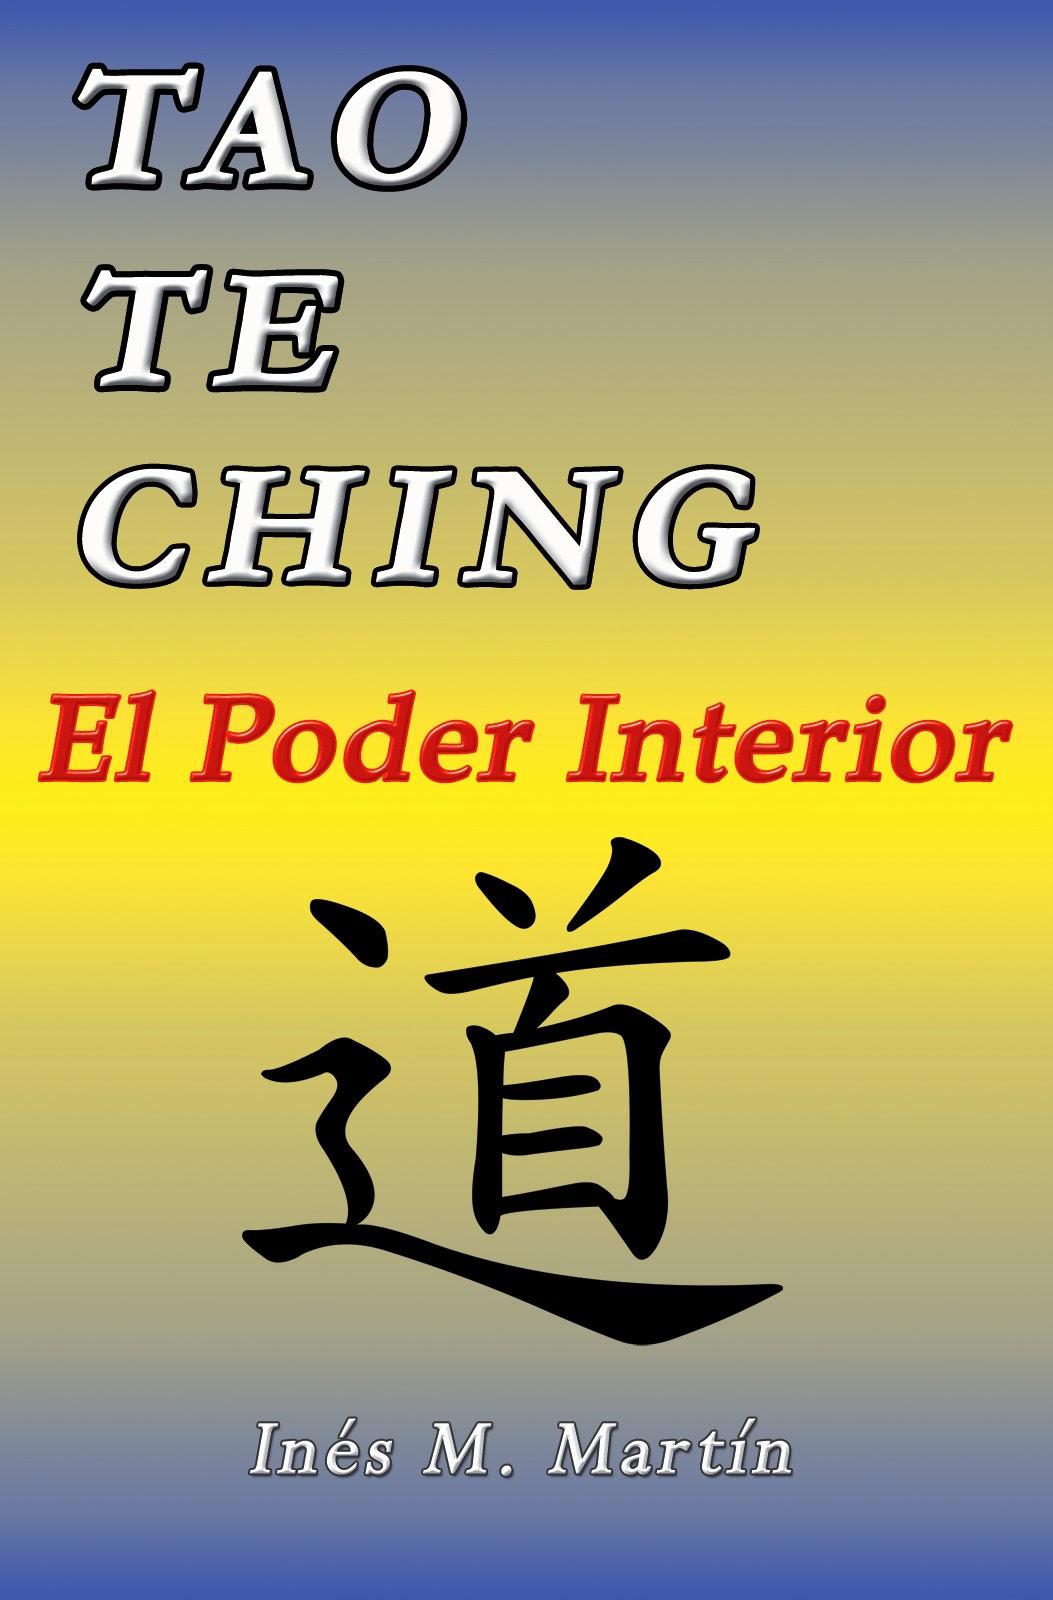 TAO TE CHING: EL PODER INTERIOR